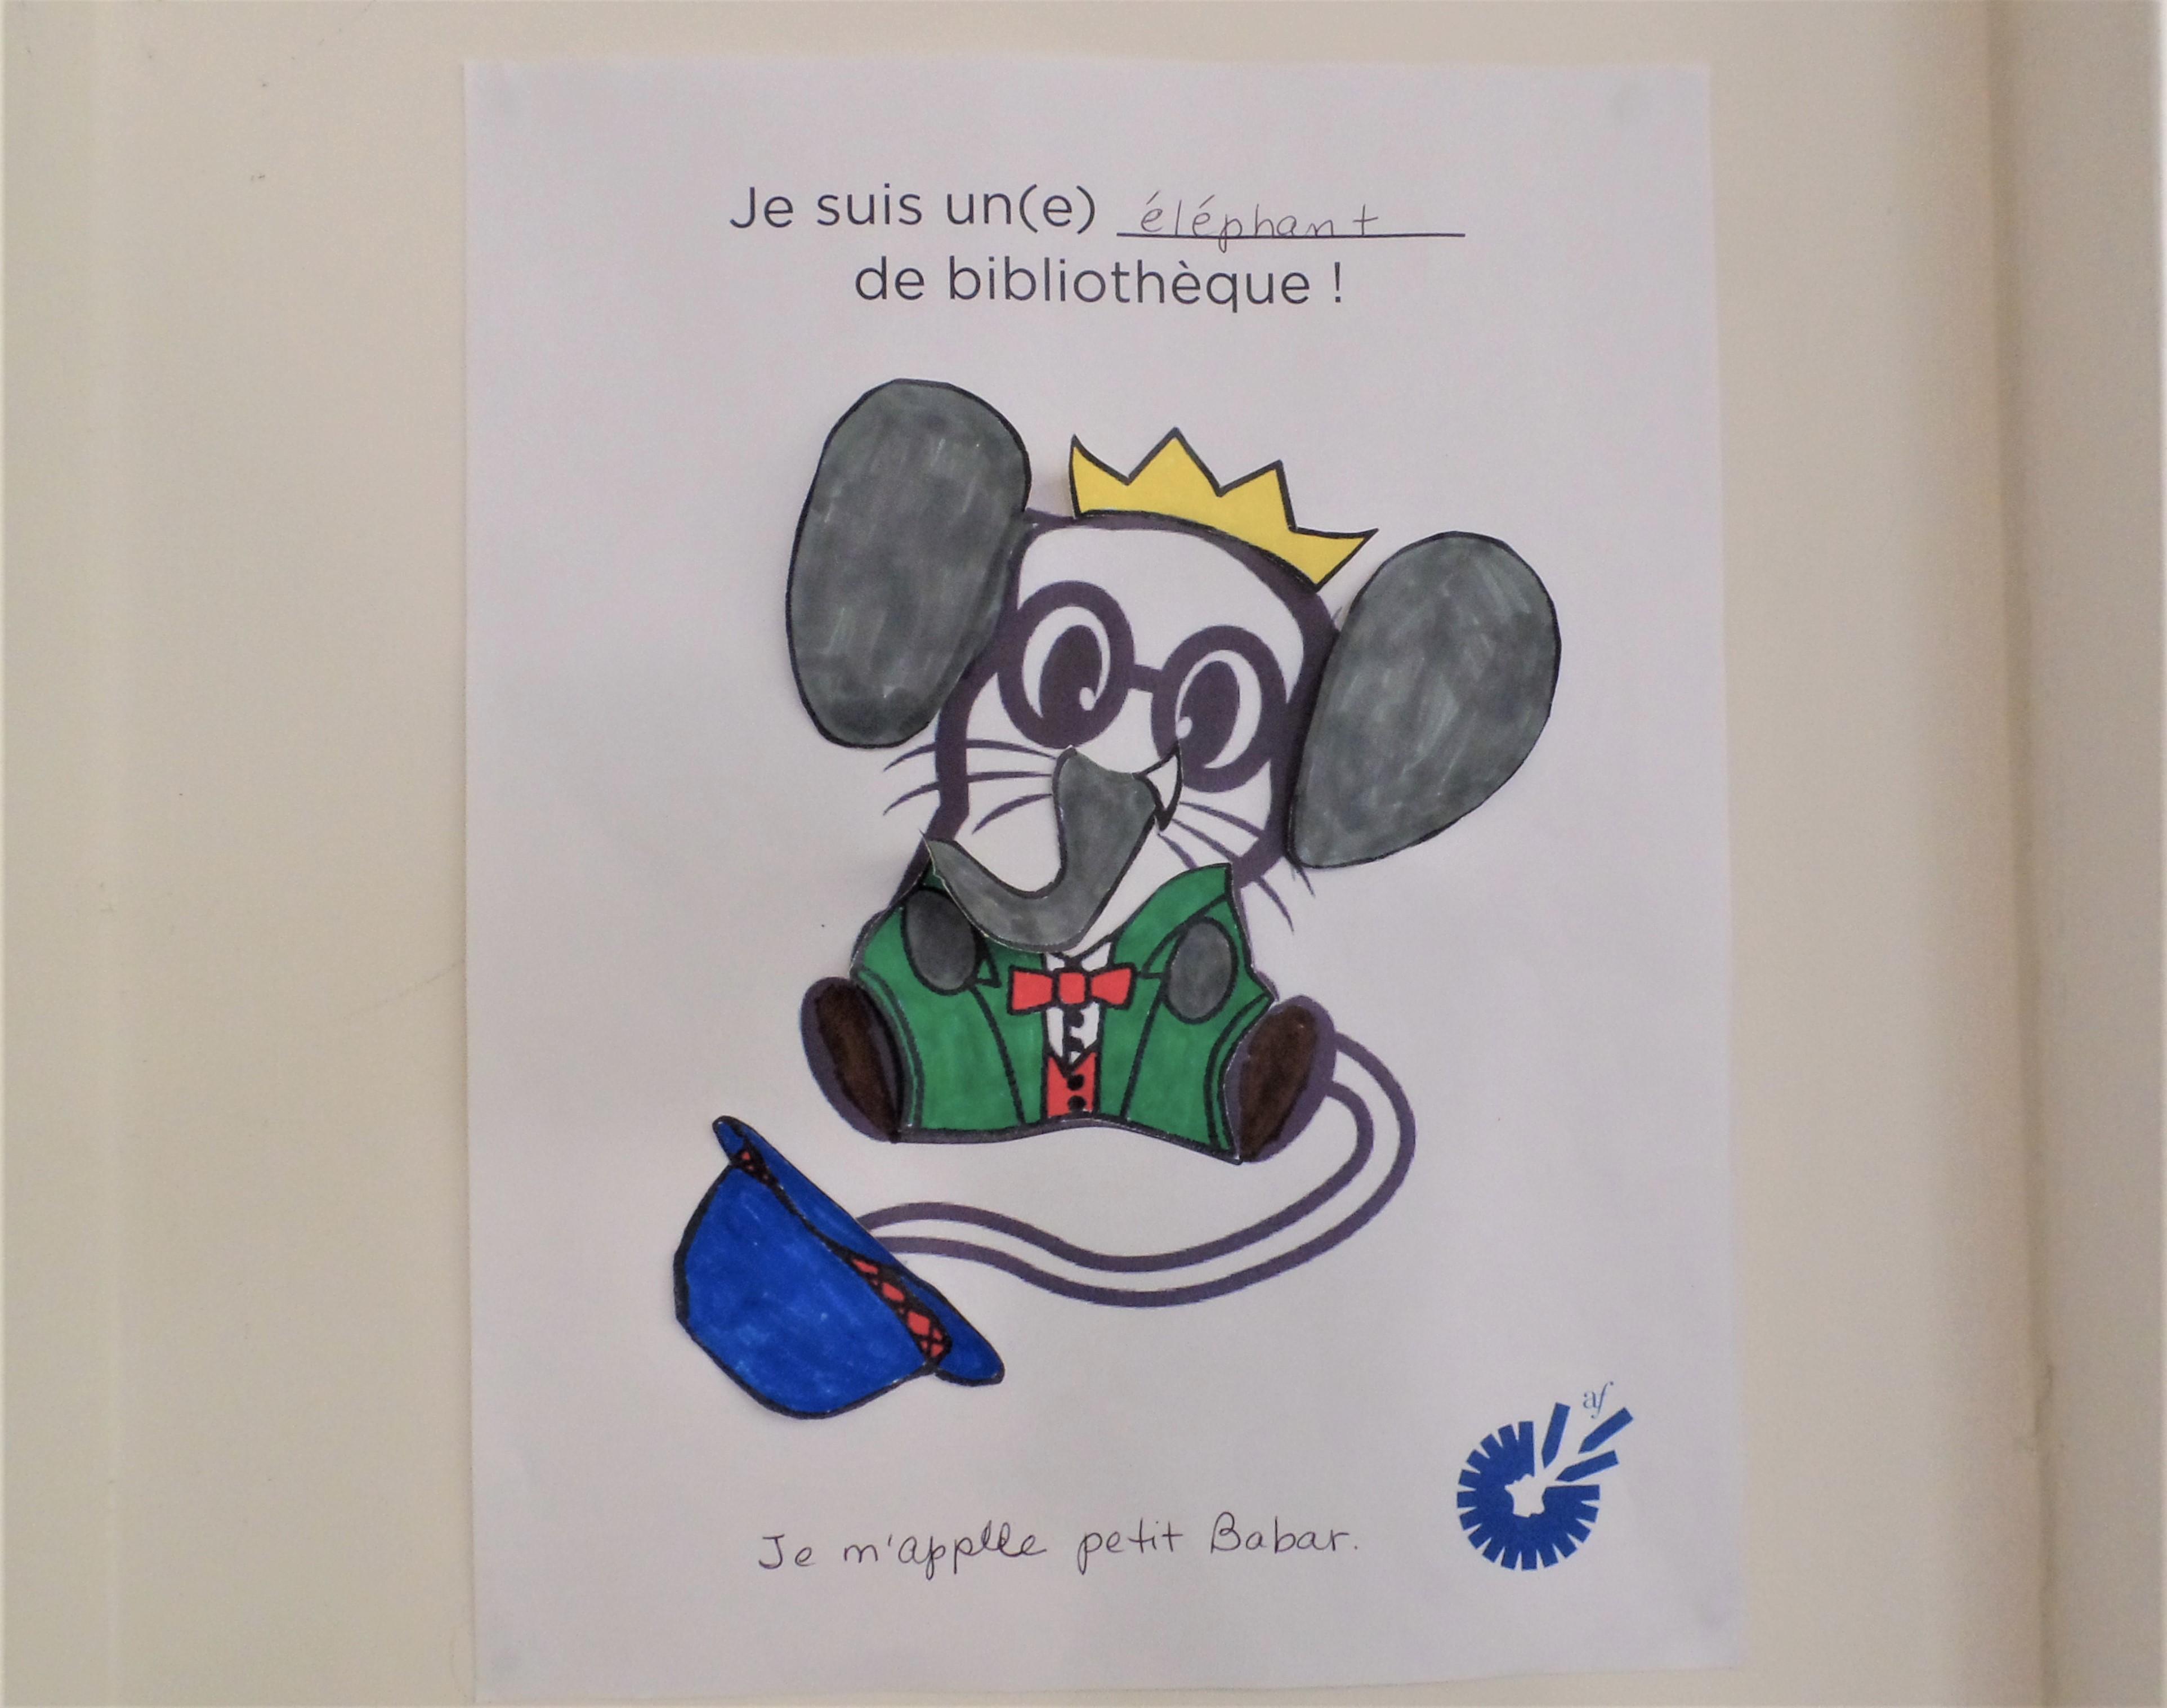 Petit Babar